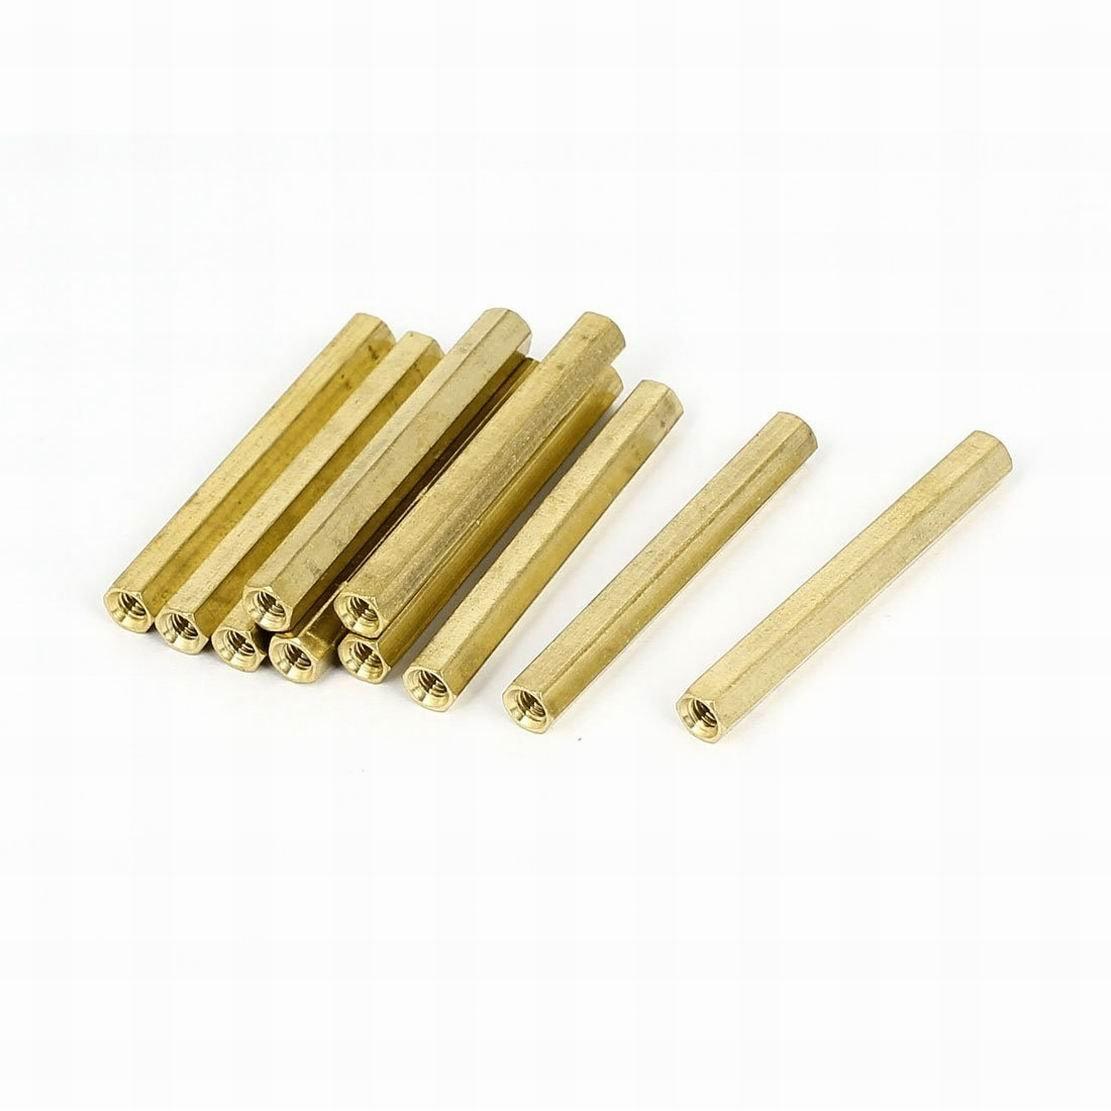 Houseuse M4 x 18mm Female Threaded Brass Hex Standoff Pillar Spacer Nut 25pcs